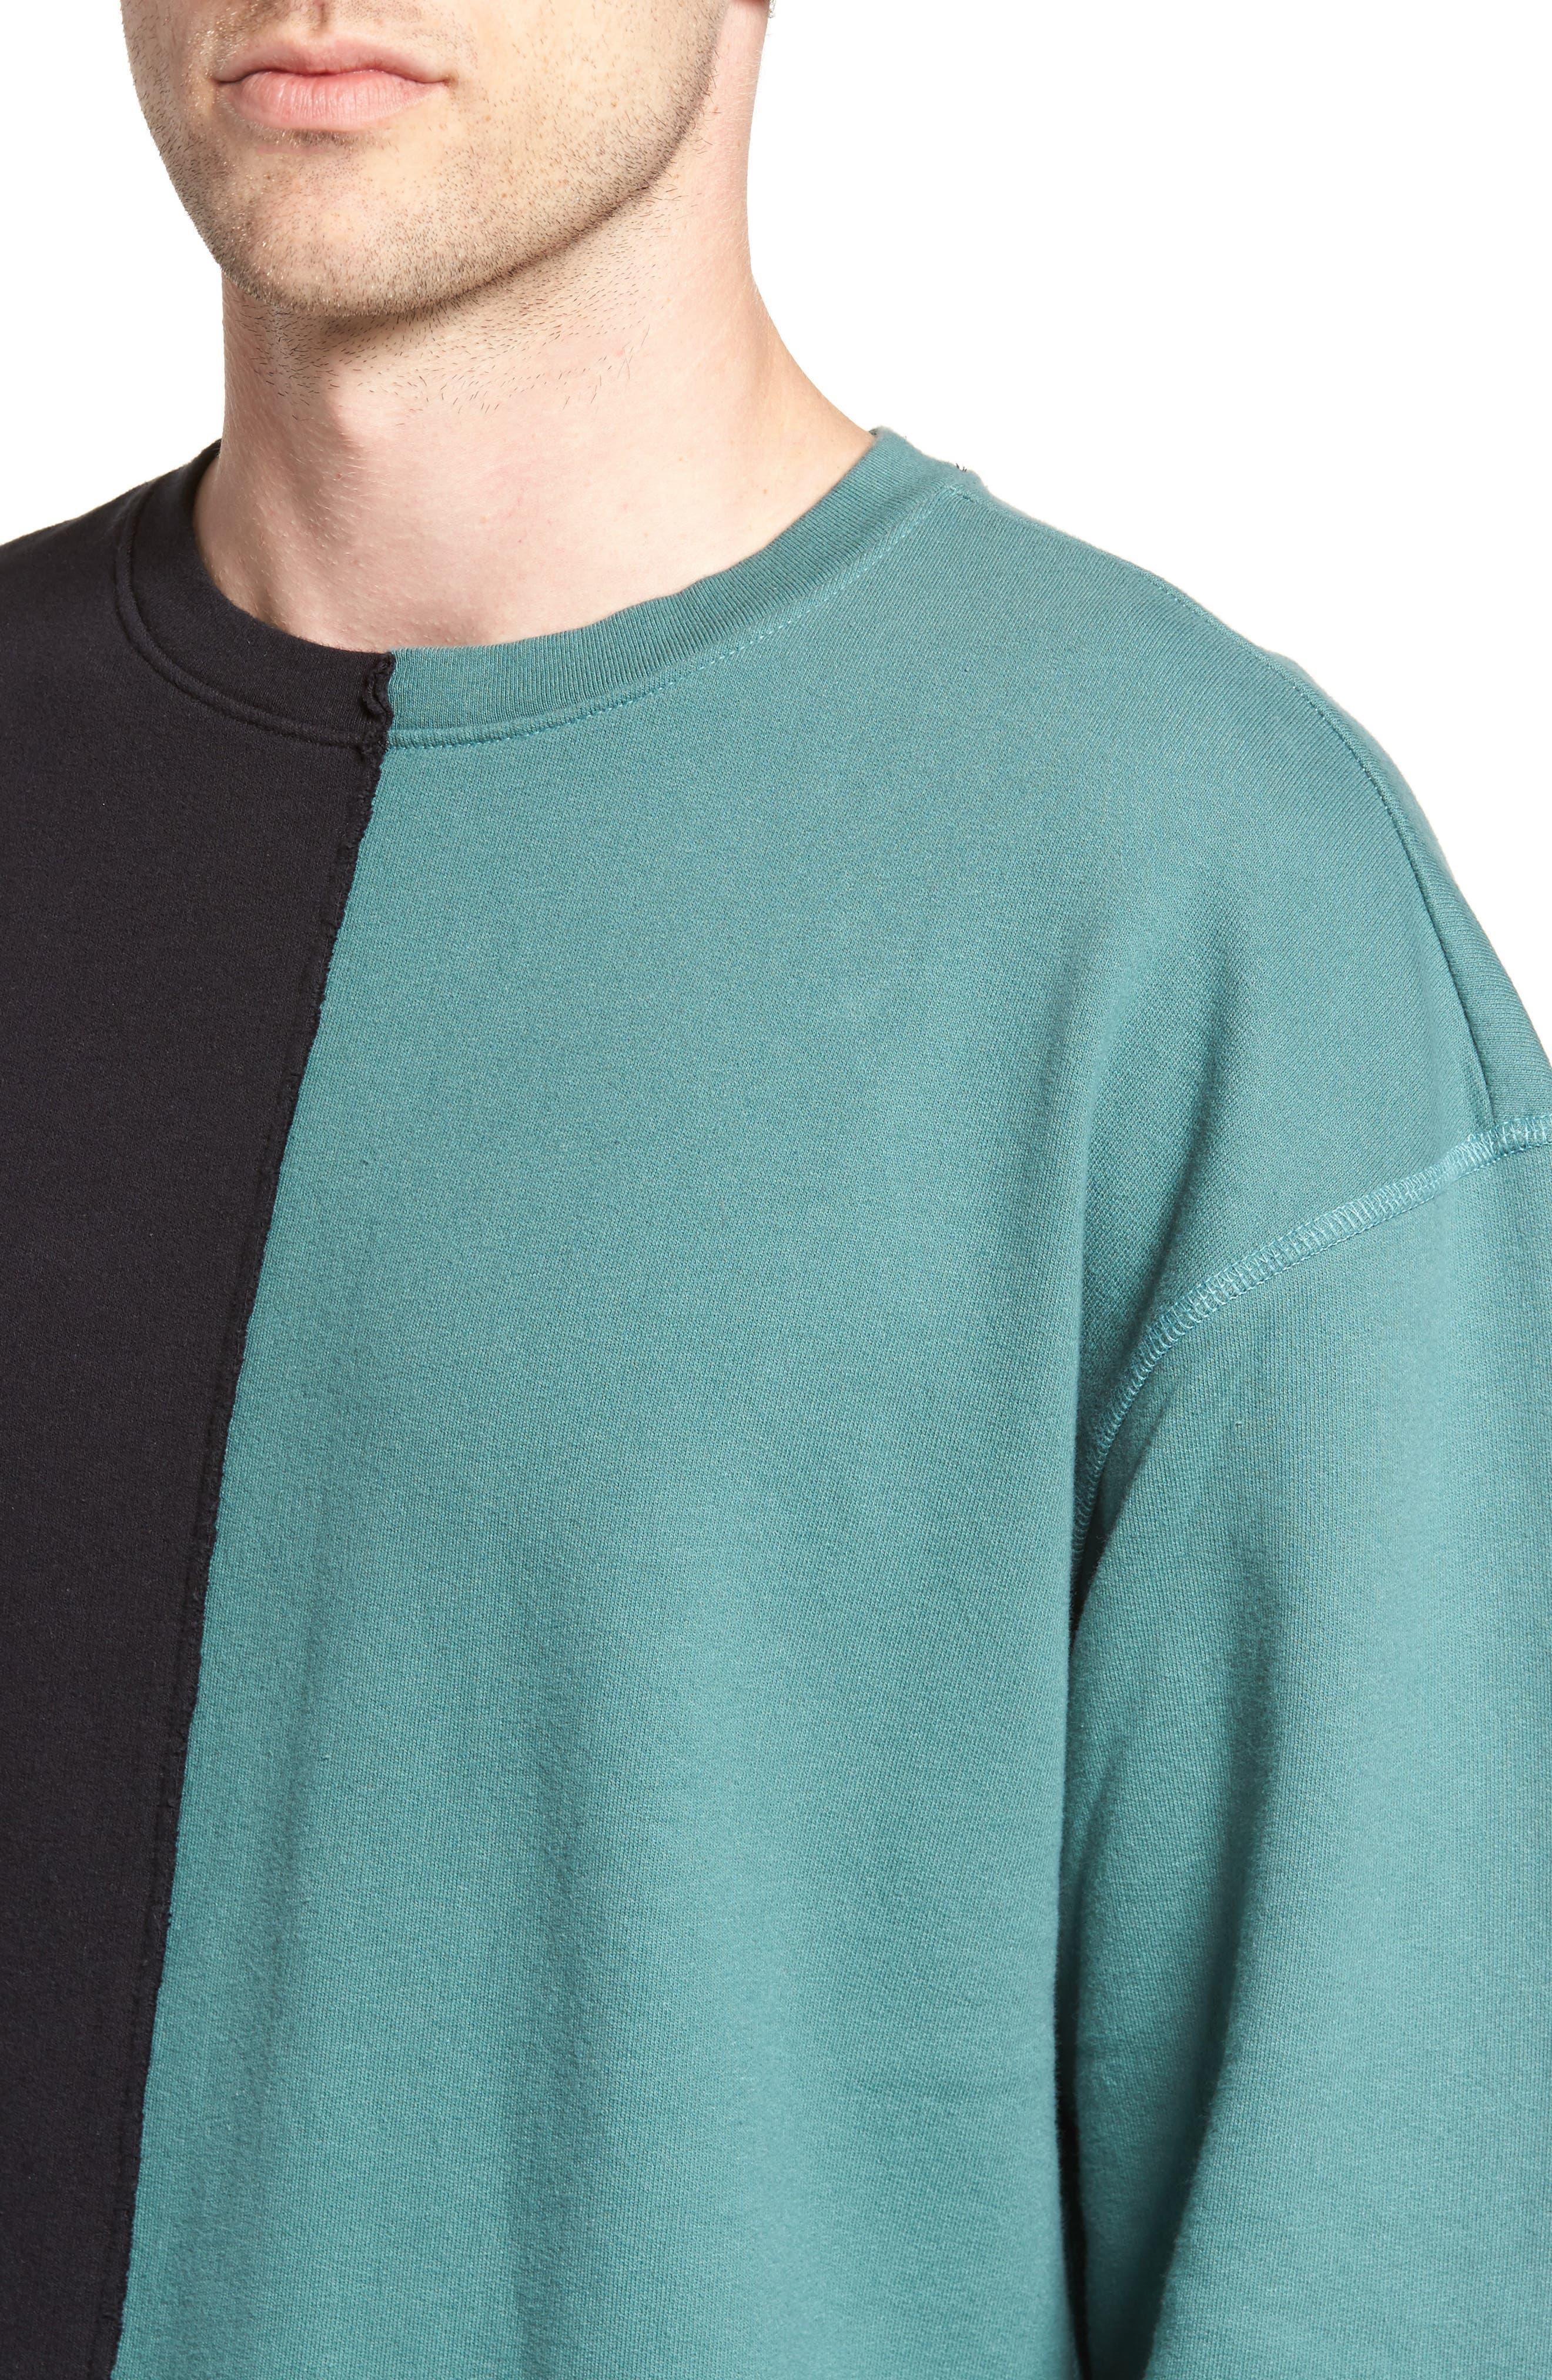 Colorblock T-Shirt,                             Alternate thumbnail 4, color,                             001